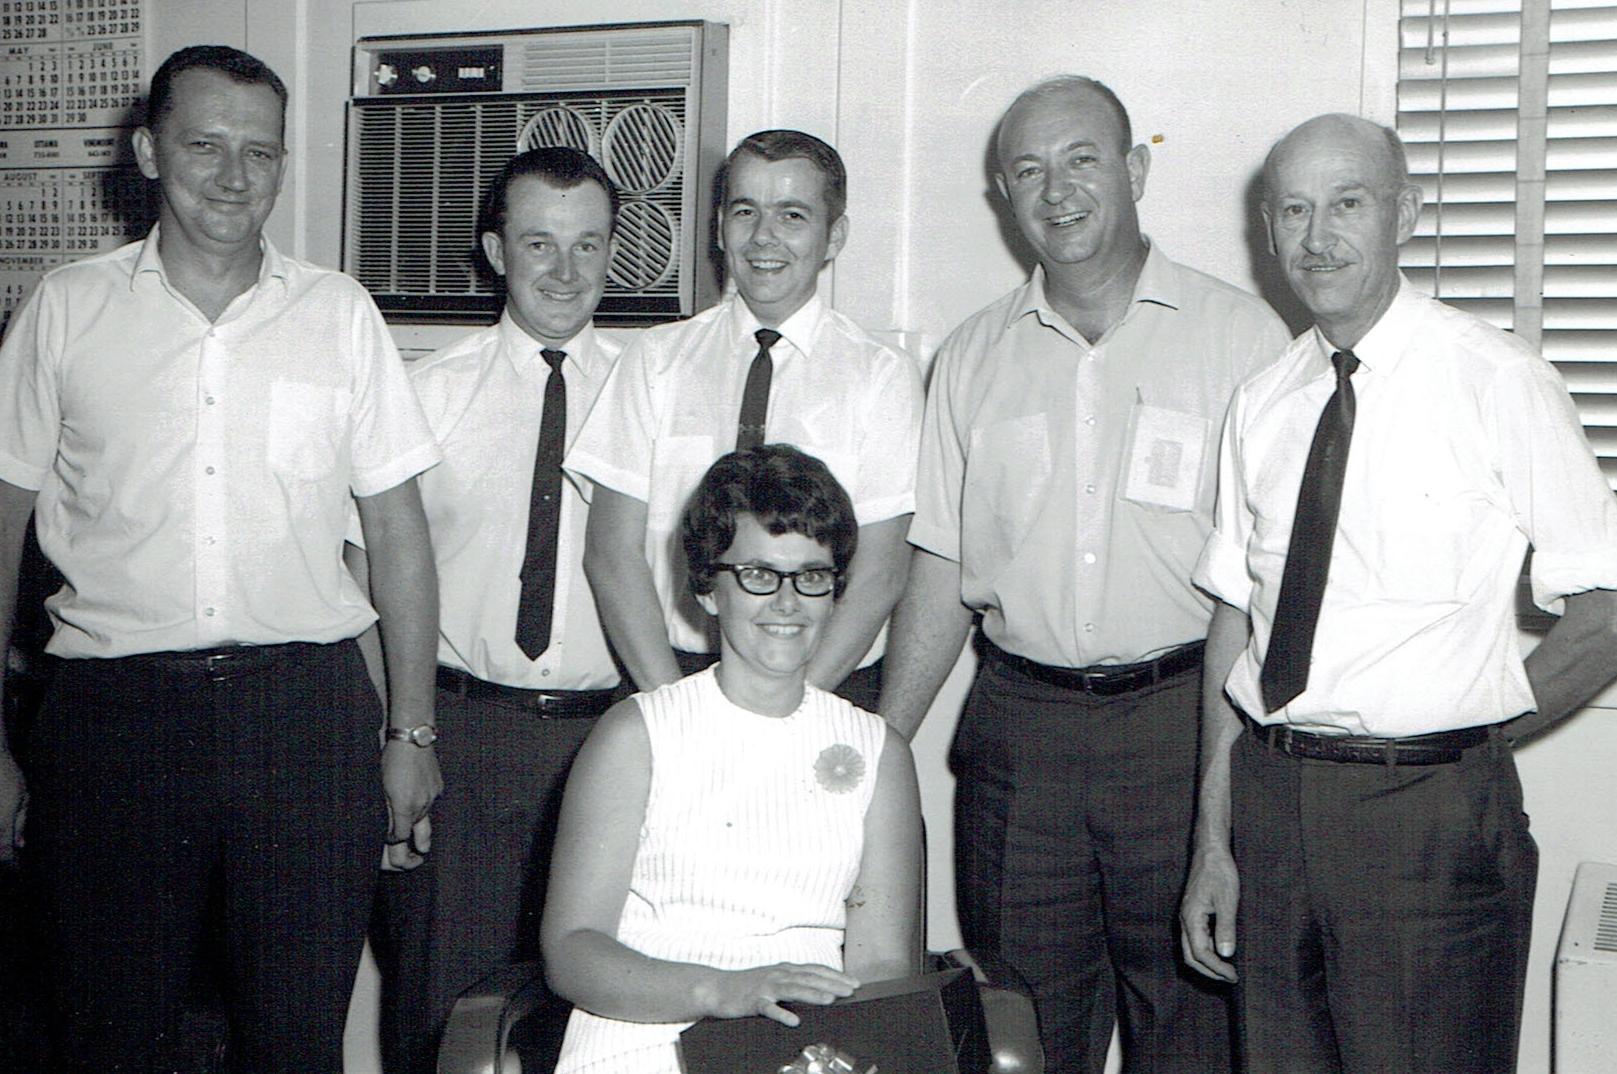 1969 aCCOUNTING STAFF: rAY sMITH, gRY kELLY, rON hENRY, tO hANLEY, aLEX fRASER, jENNIE kILLIAN